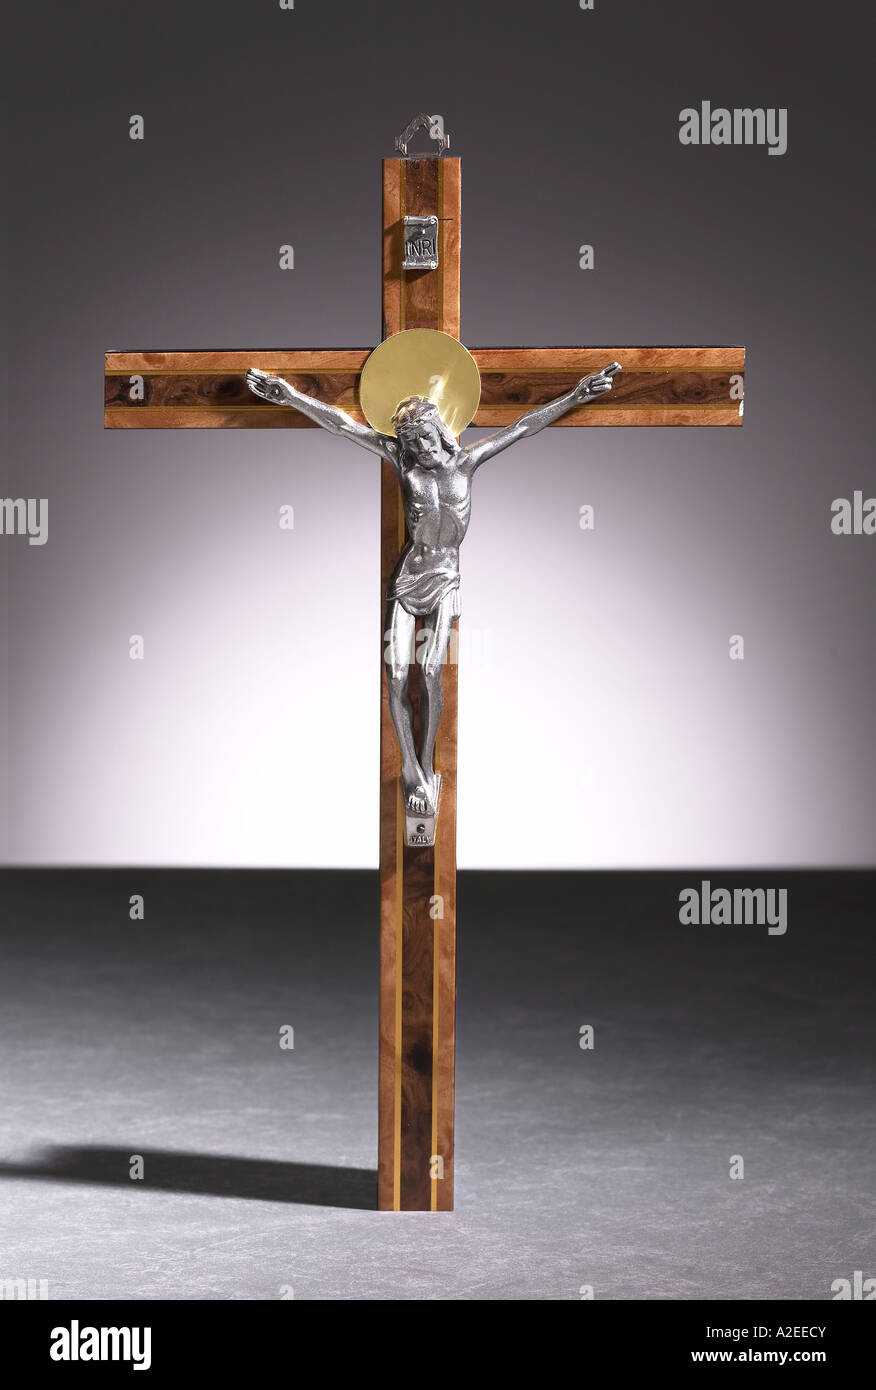 risen christ cross stock photos u0026 risen christ cross stock images